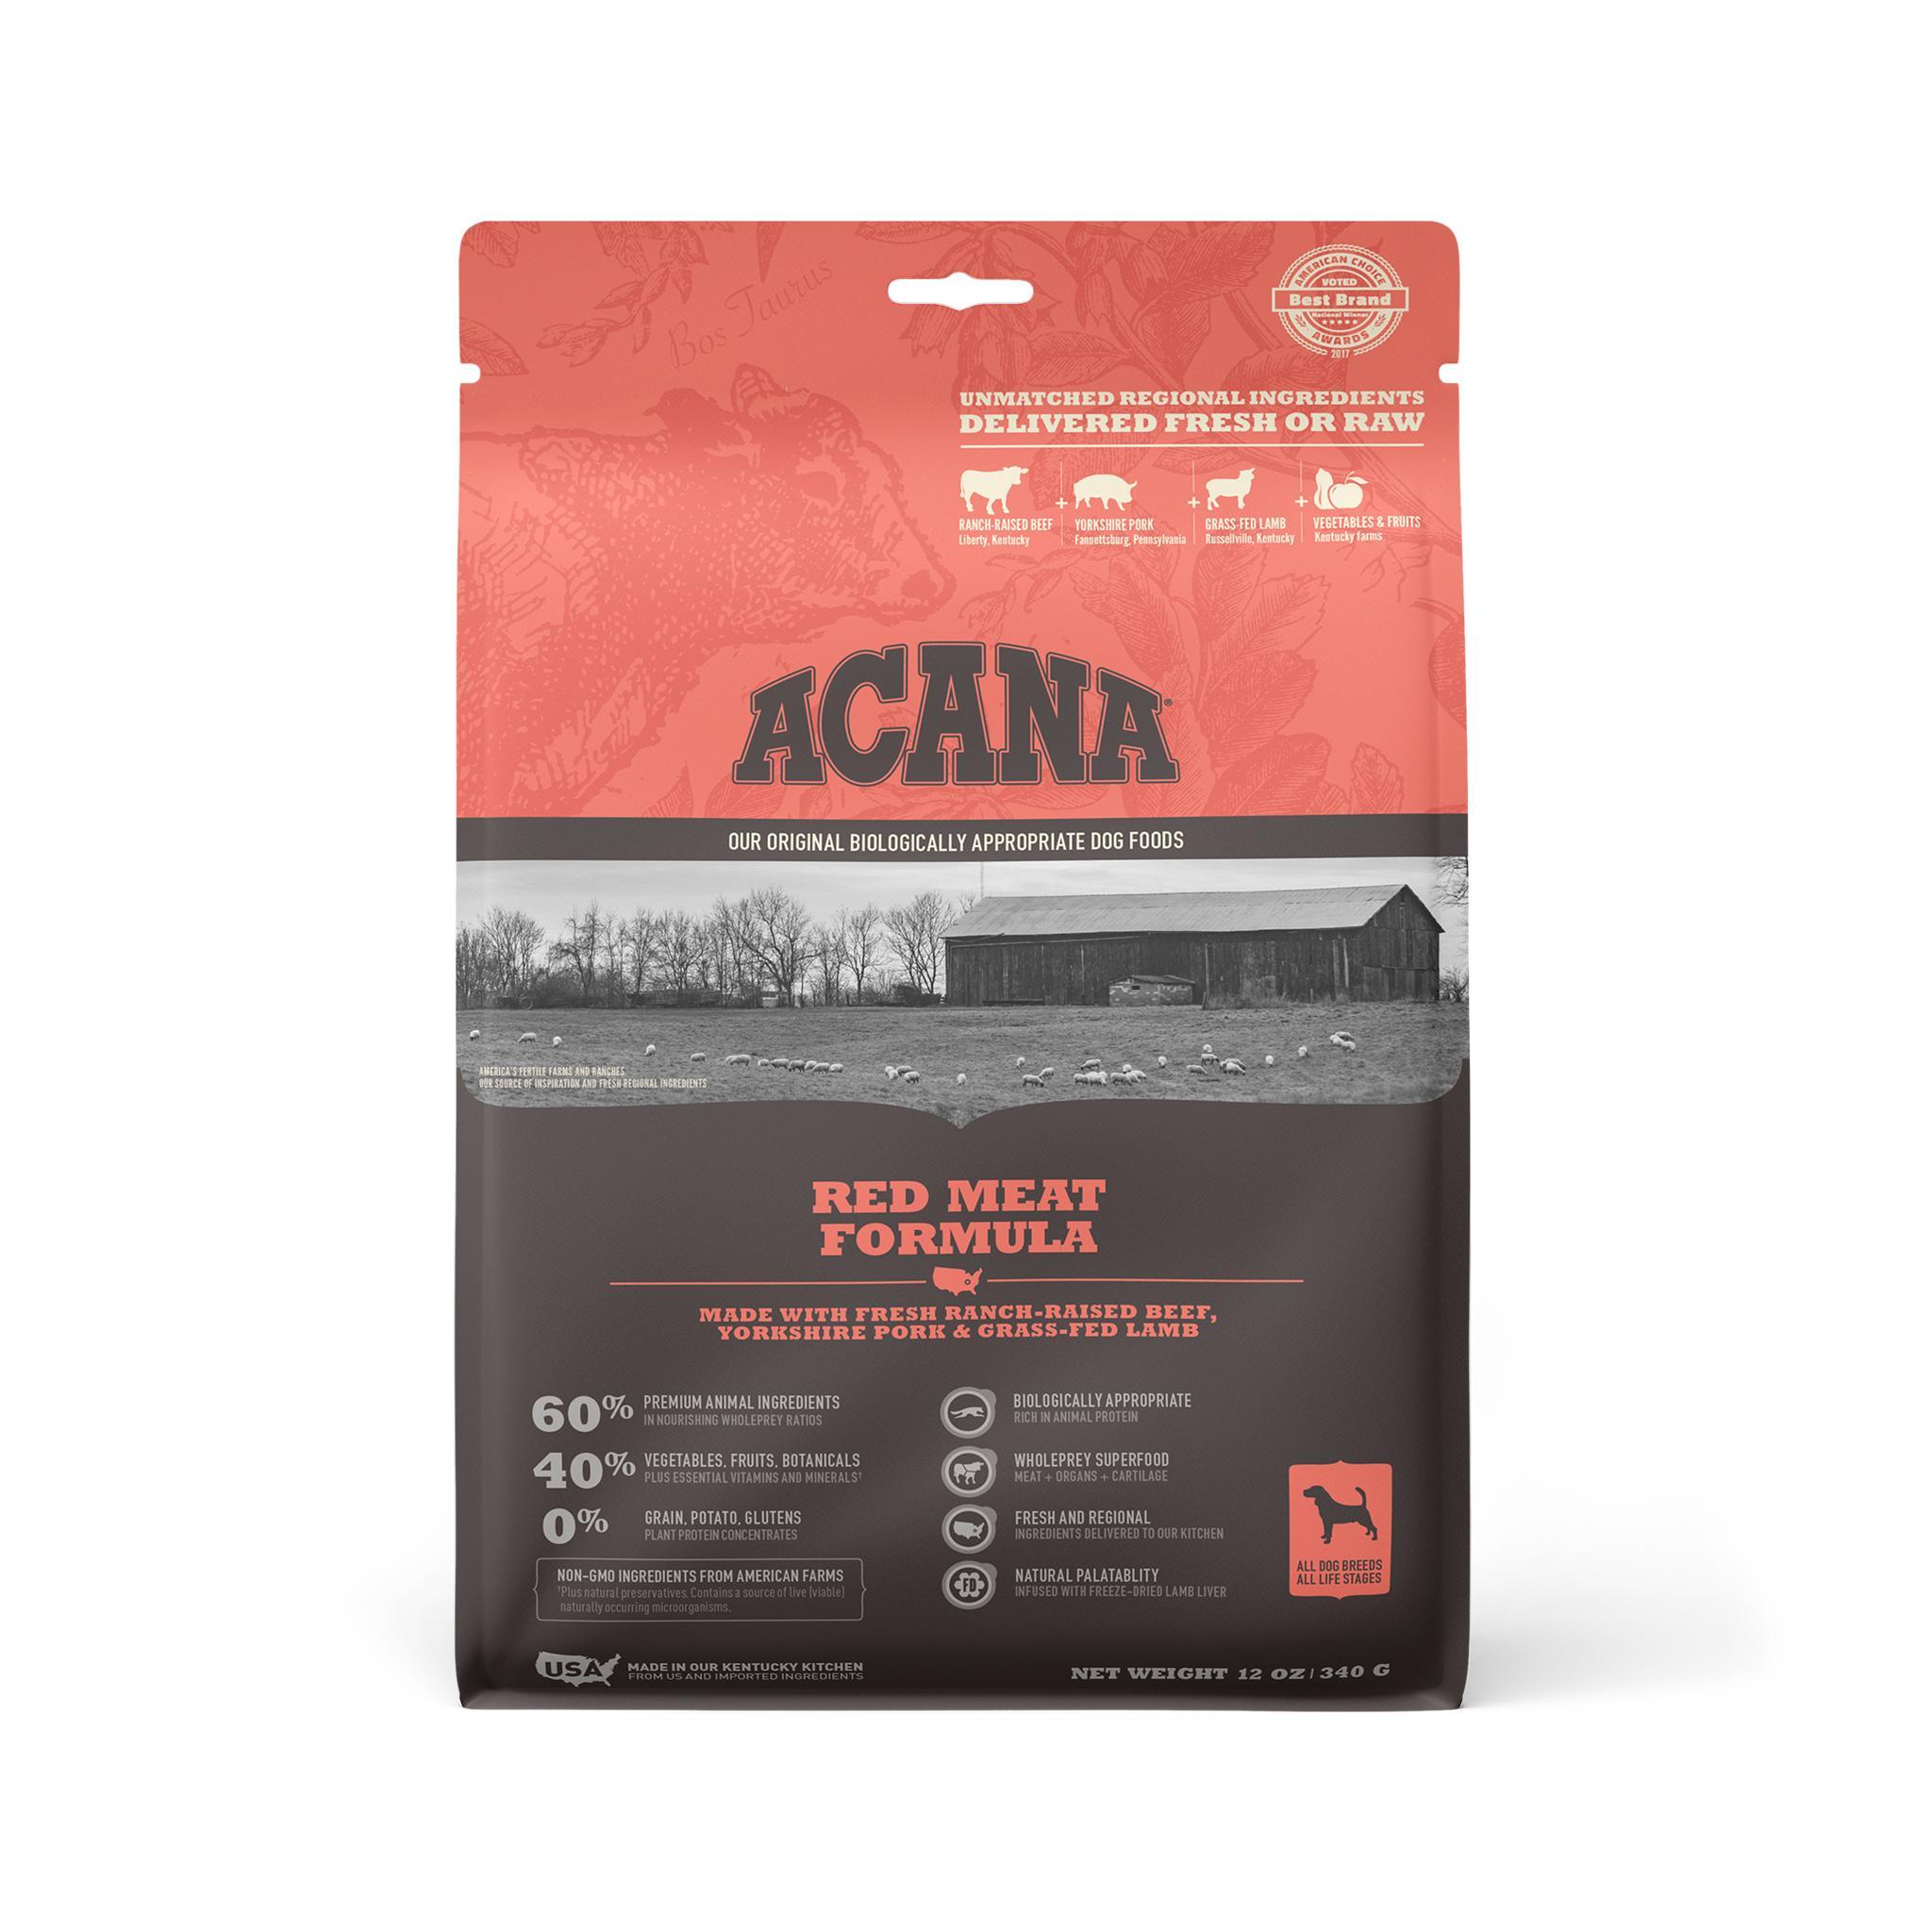 ACANA Red Meat Grain-Free Dry Dog Food, 12-oz